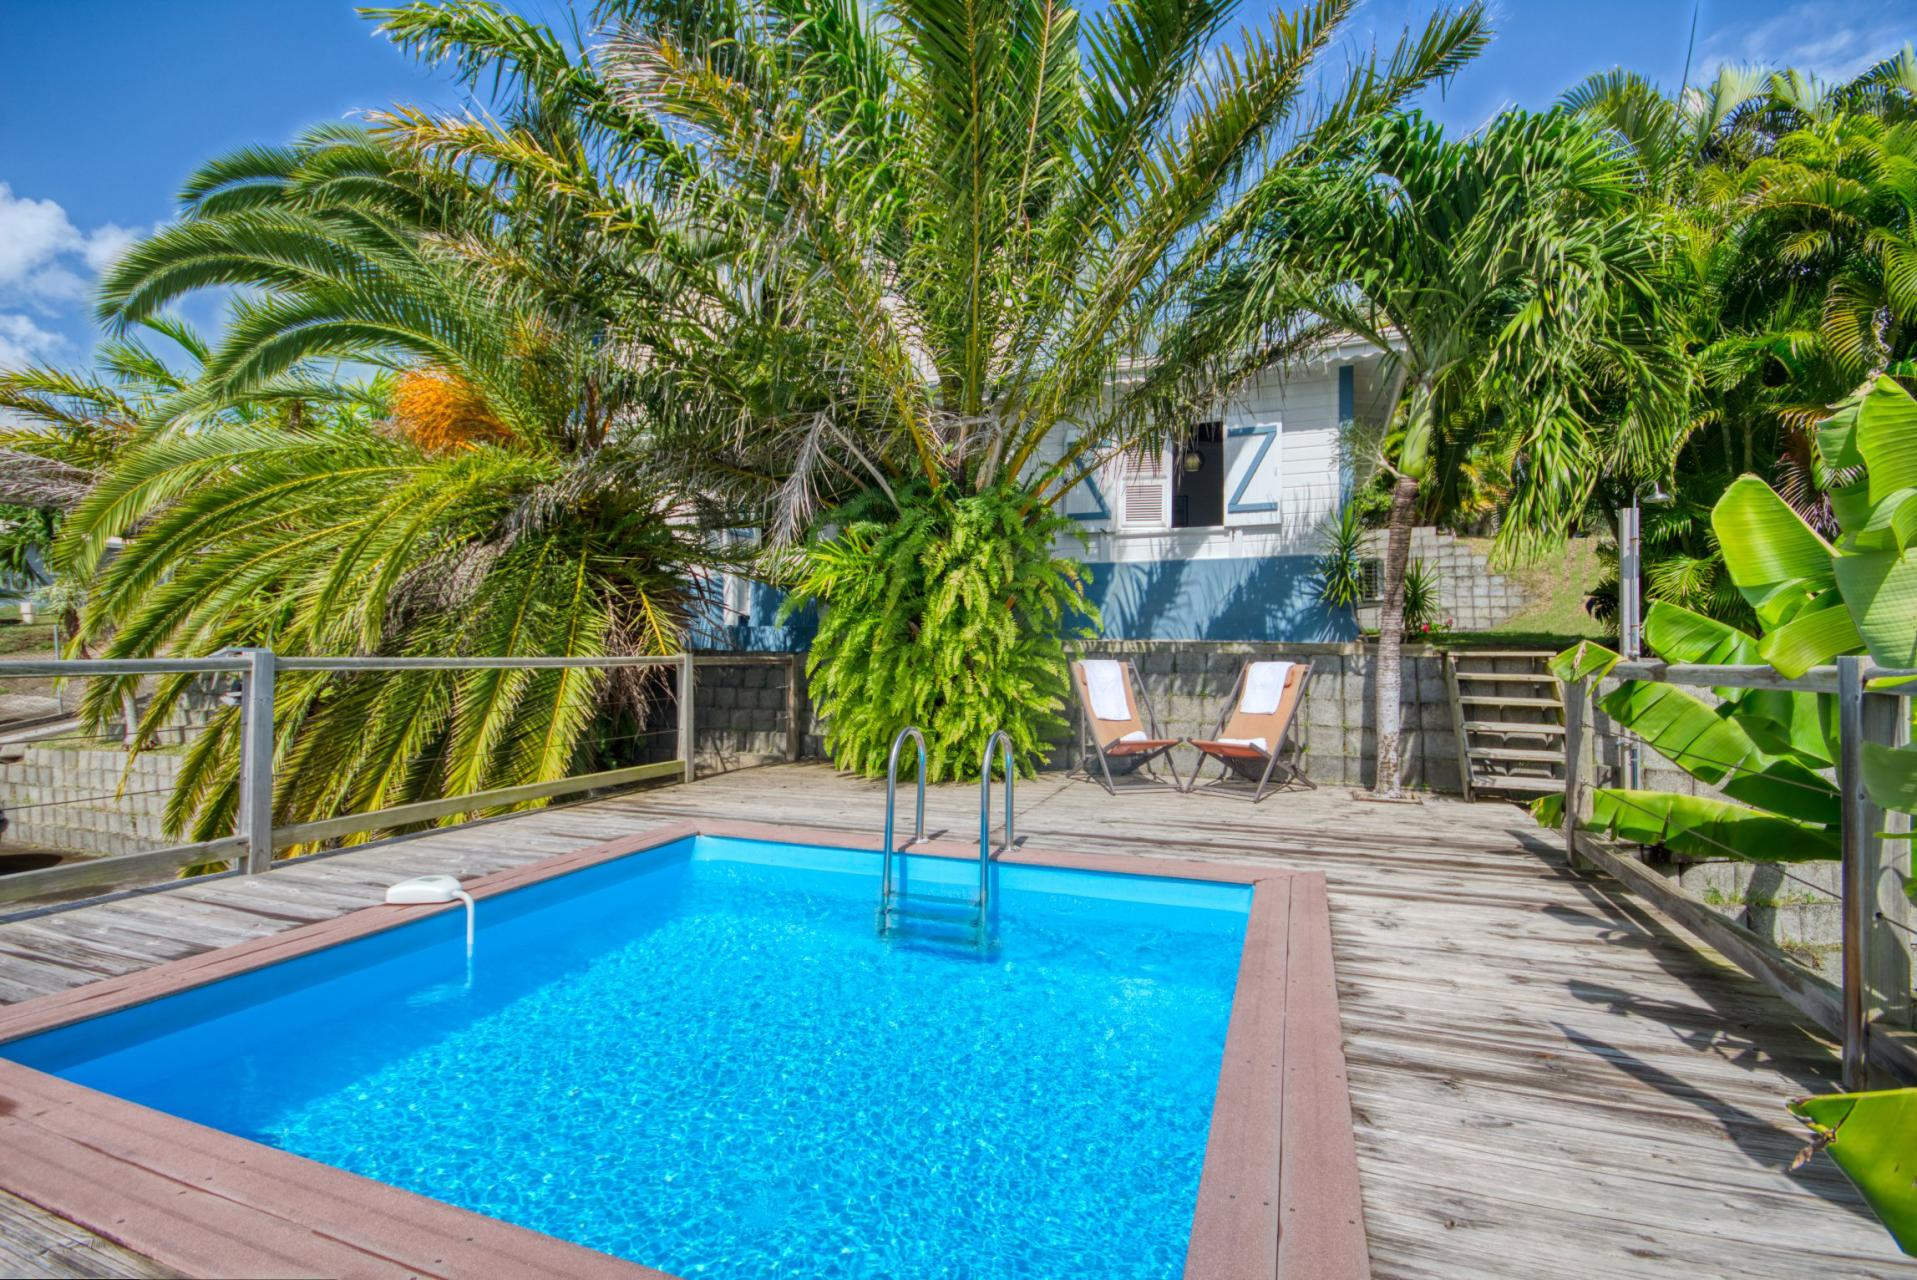 location maison martinique avec piscine